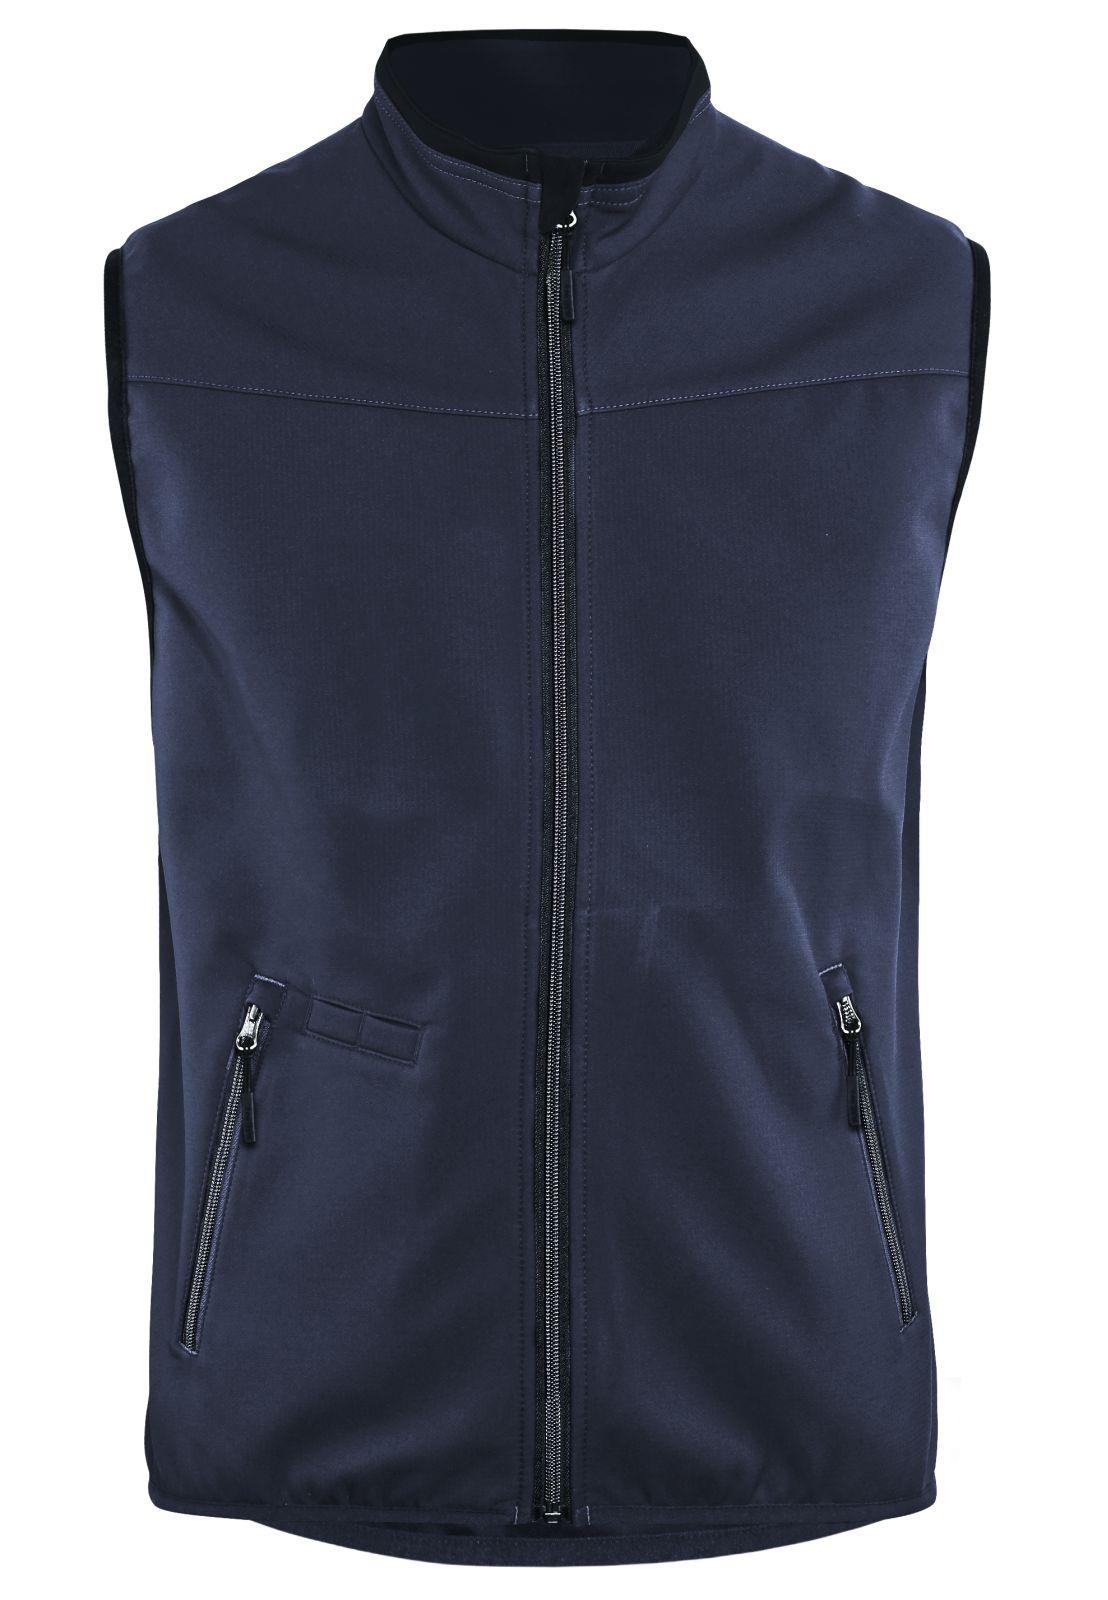 Blaklader Softshell bodywarmers 38502516 donker marineblauw-zwart(8699)